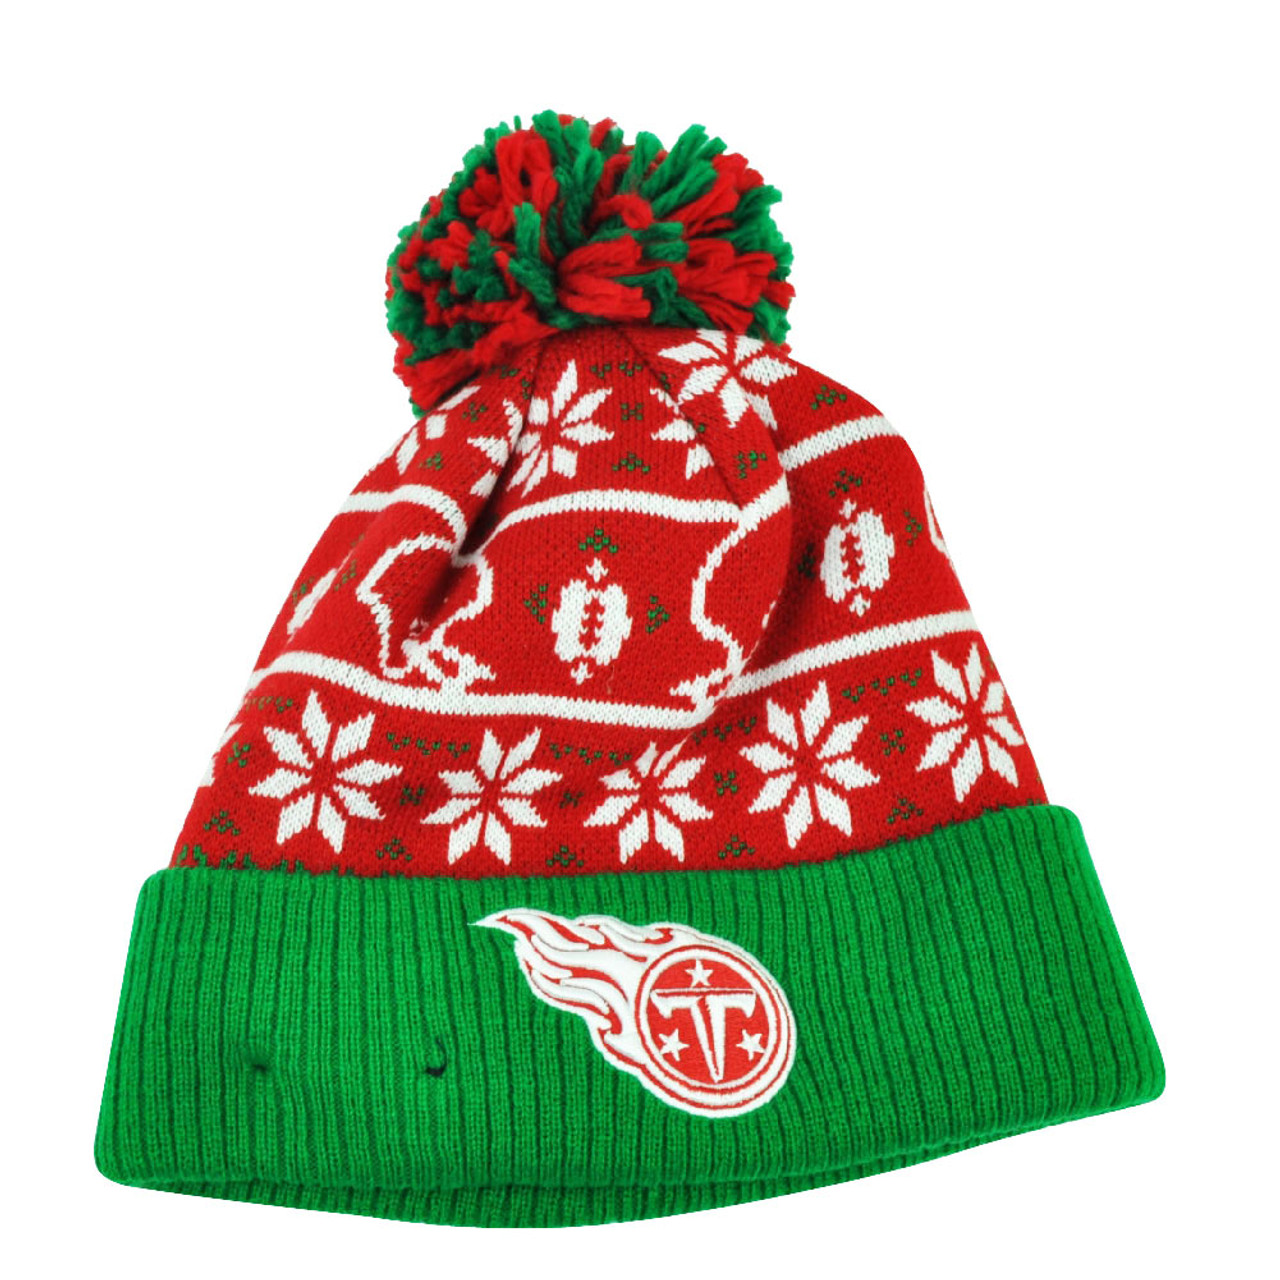 c3497797 NFL New Era Sweater Chill Tennessee Titans Pom Pom Cuffed Knit Beanie Winter  Hat - Cap Store Online.com